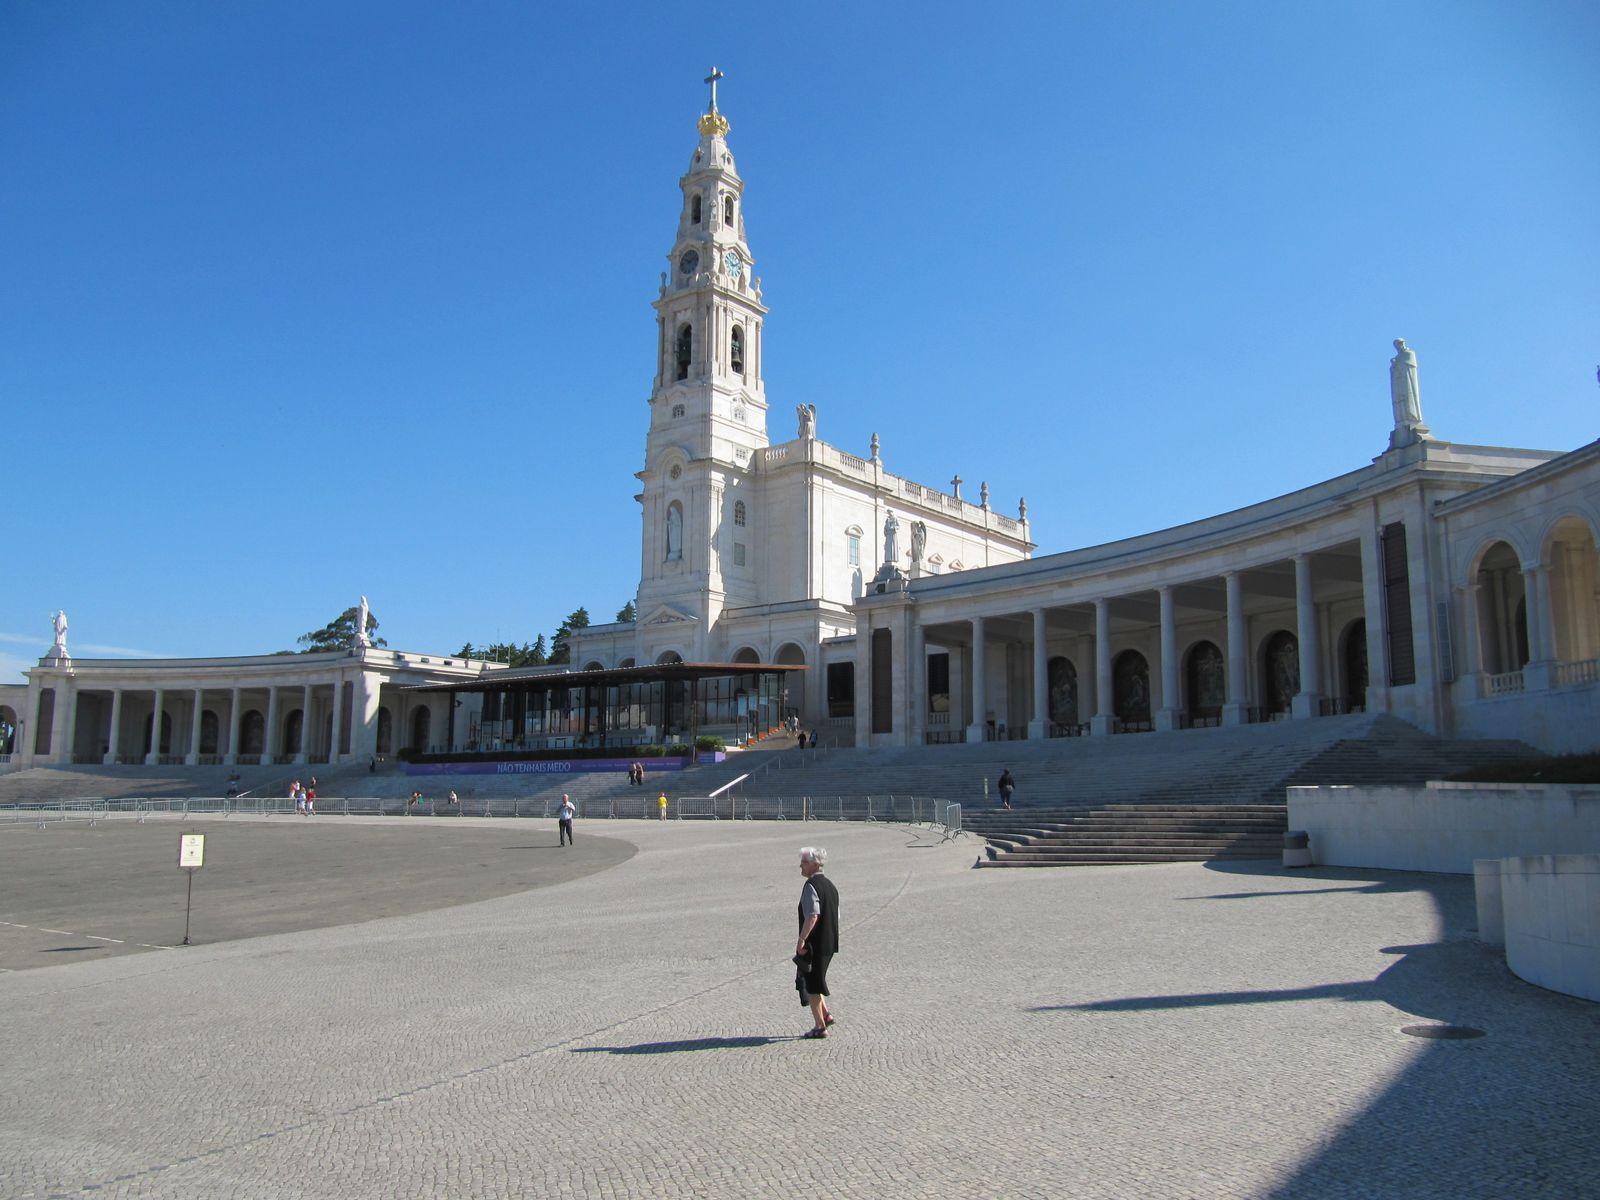 Voyage au Portugal en juillet 2013